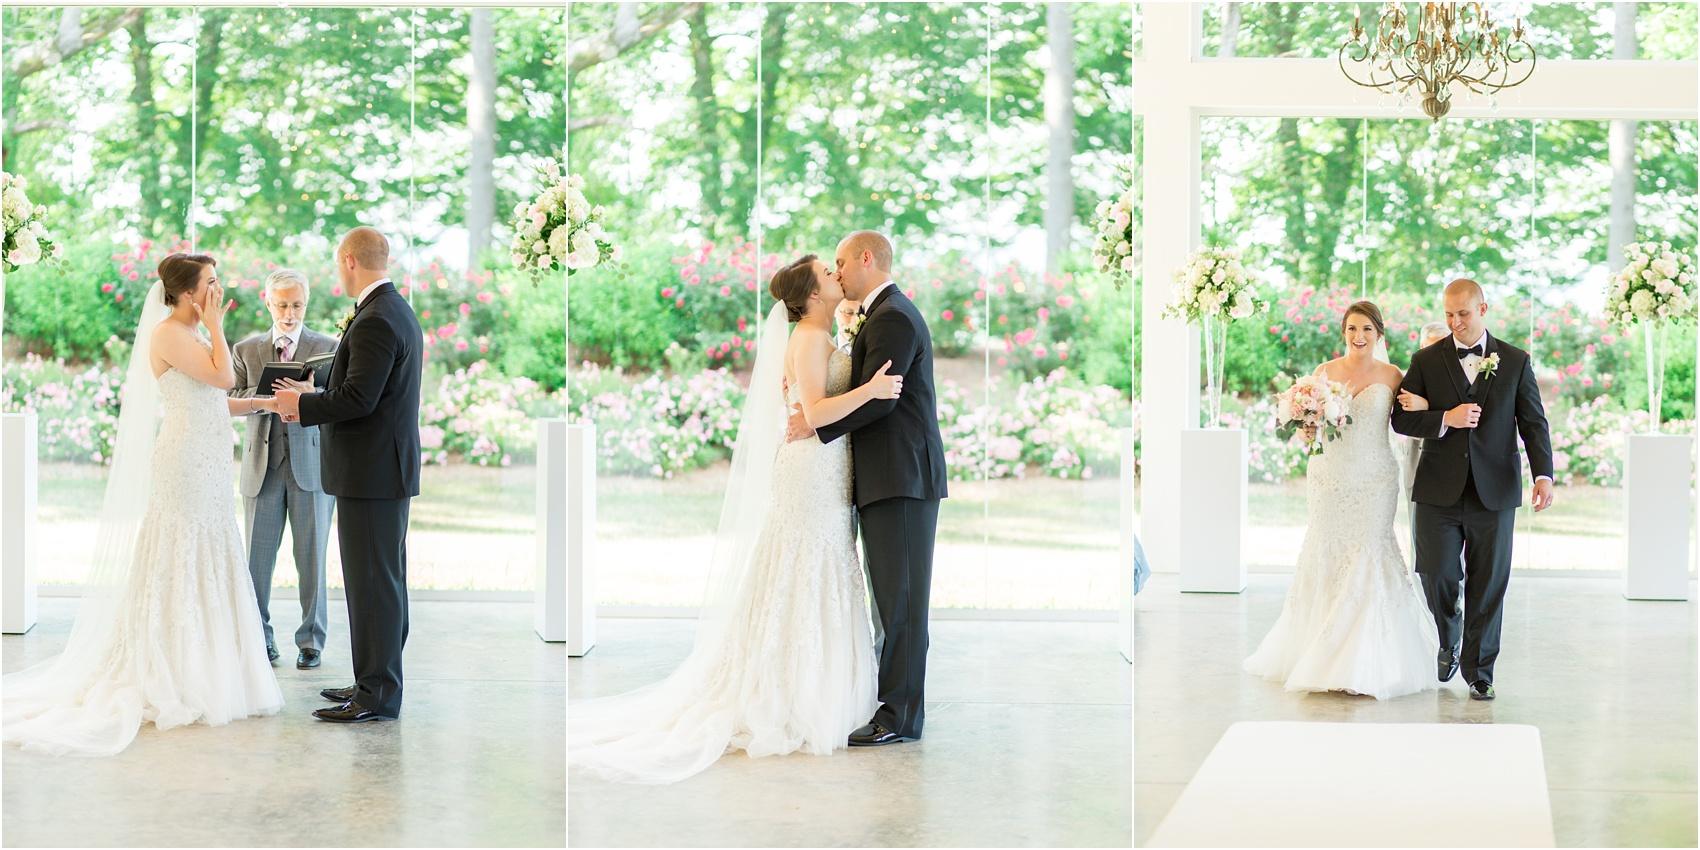 Savannah Eve Photography- Nutt Wedding- Blog-82.jpg